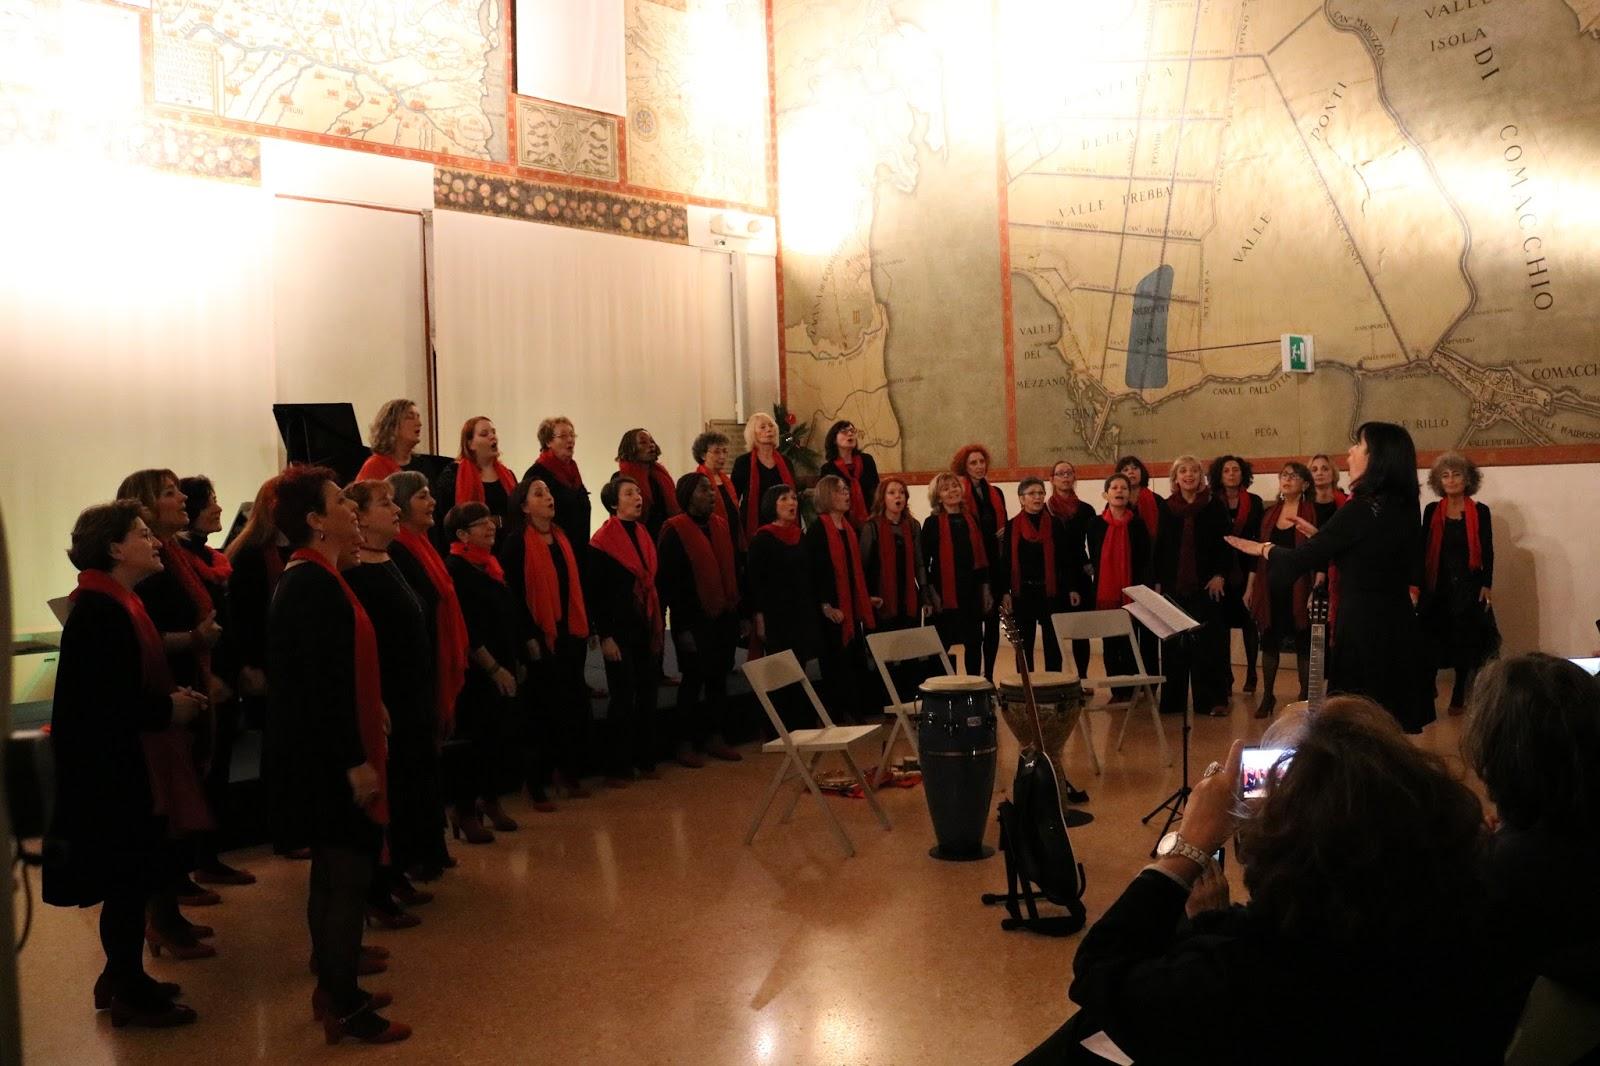 Coro Femminile SonArte